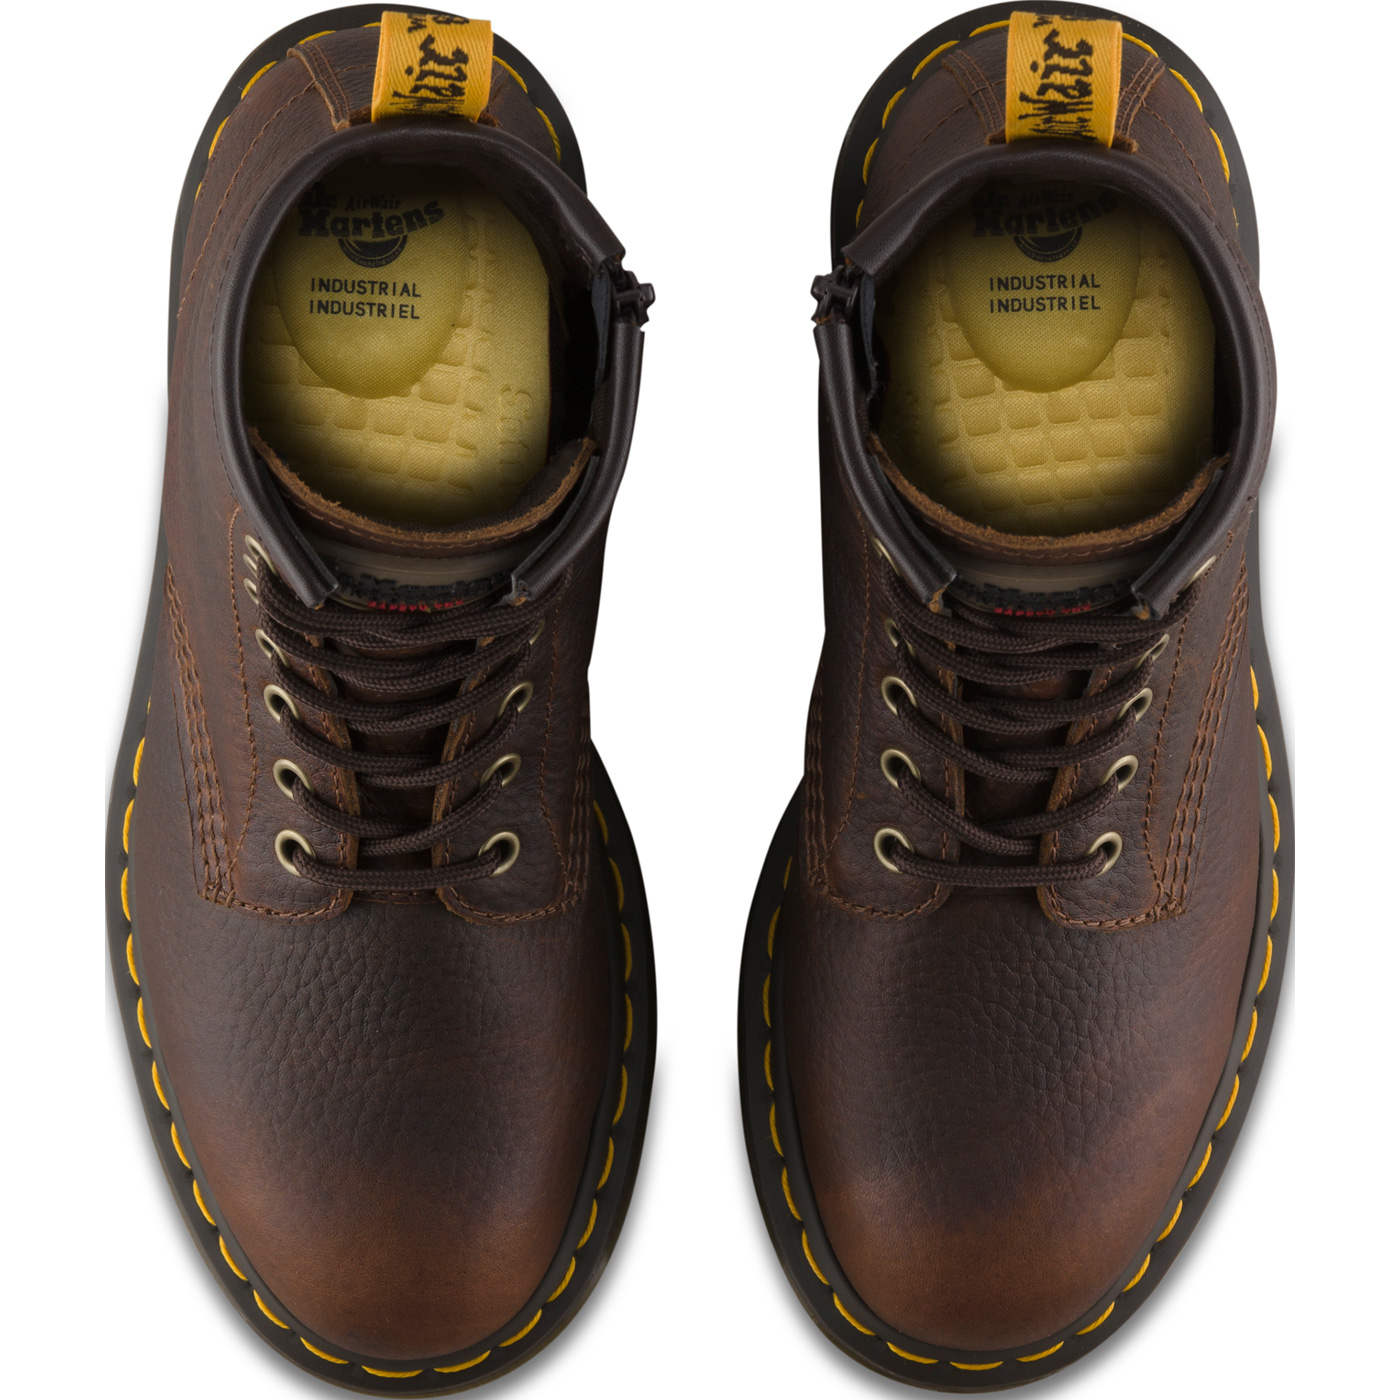 454d74250d1 Dr. Martens Icon Maple Zip Women's Steel Toe Electrical Hazard Work Boot